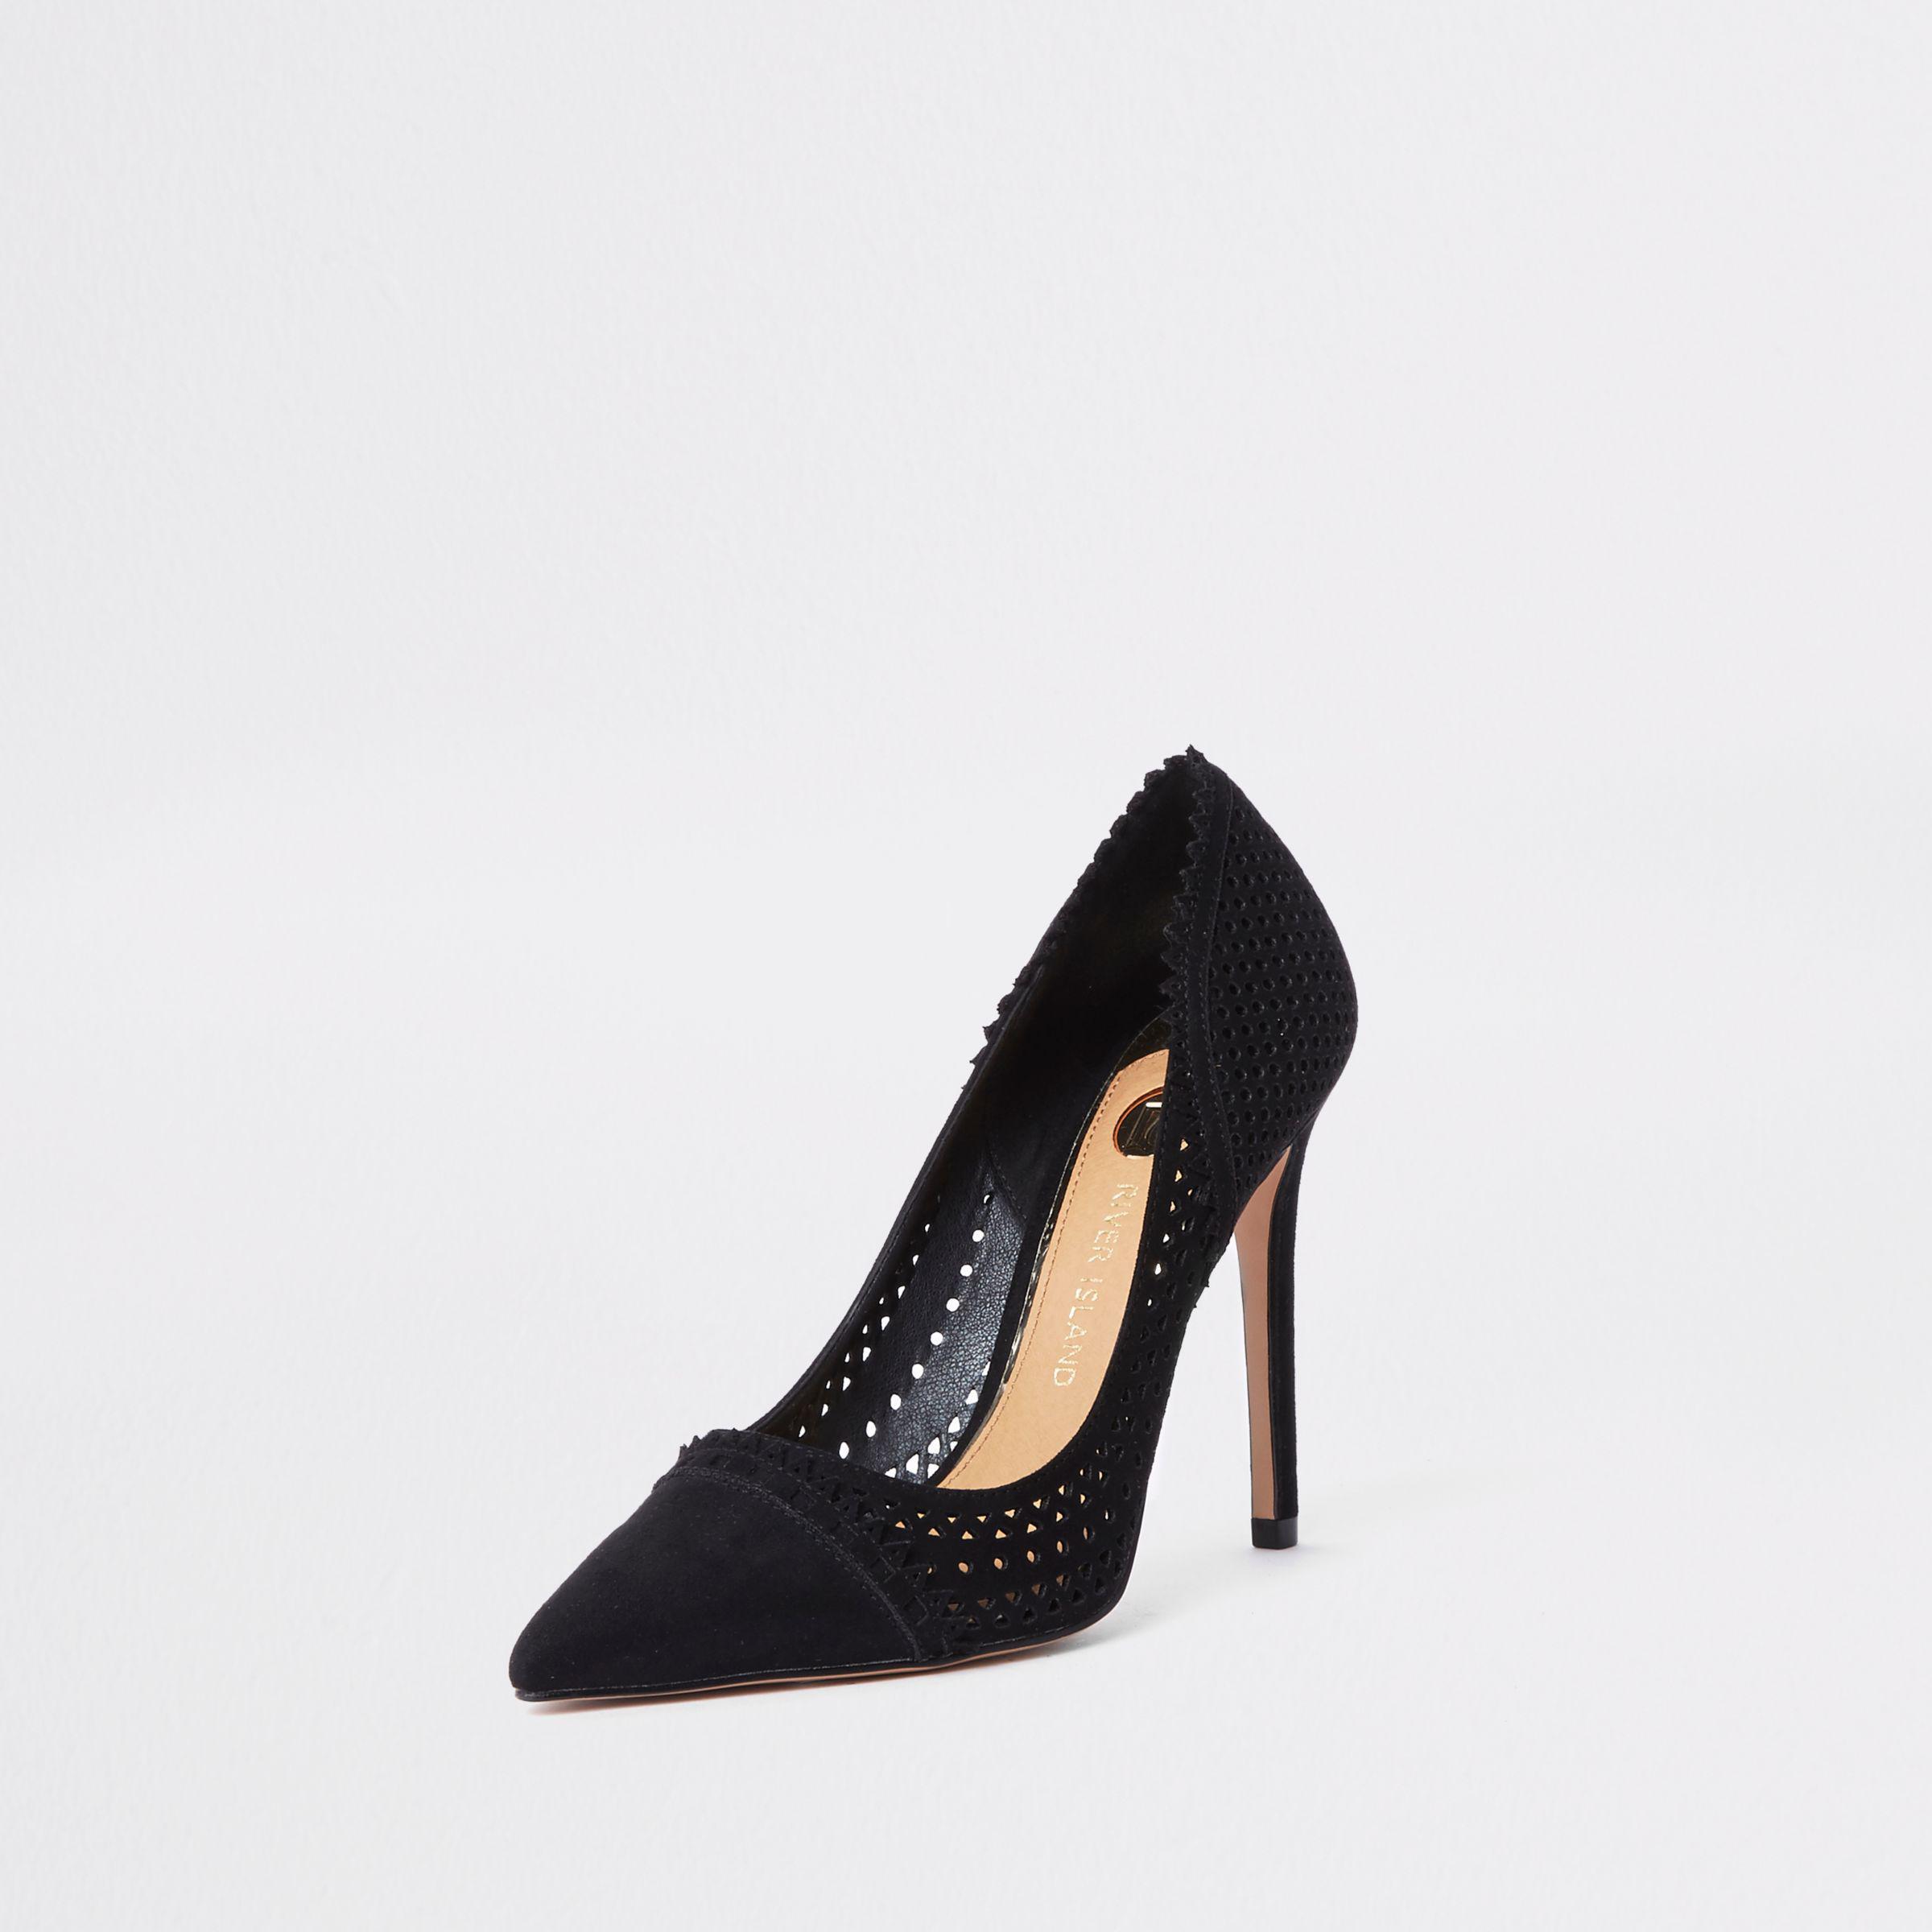 414b302b8d4a River Island Black Court Shoes - Style Guru  Fashion